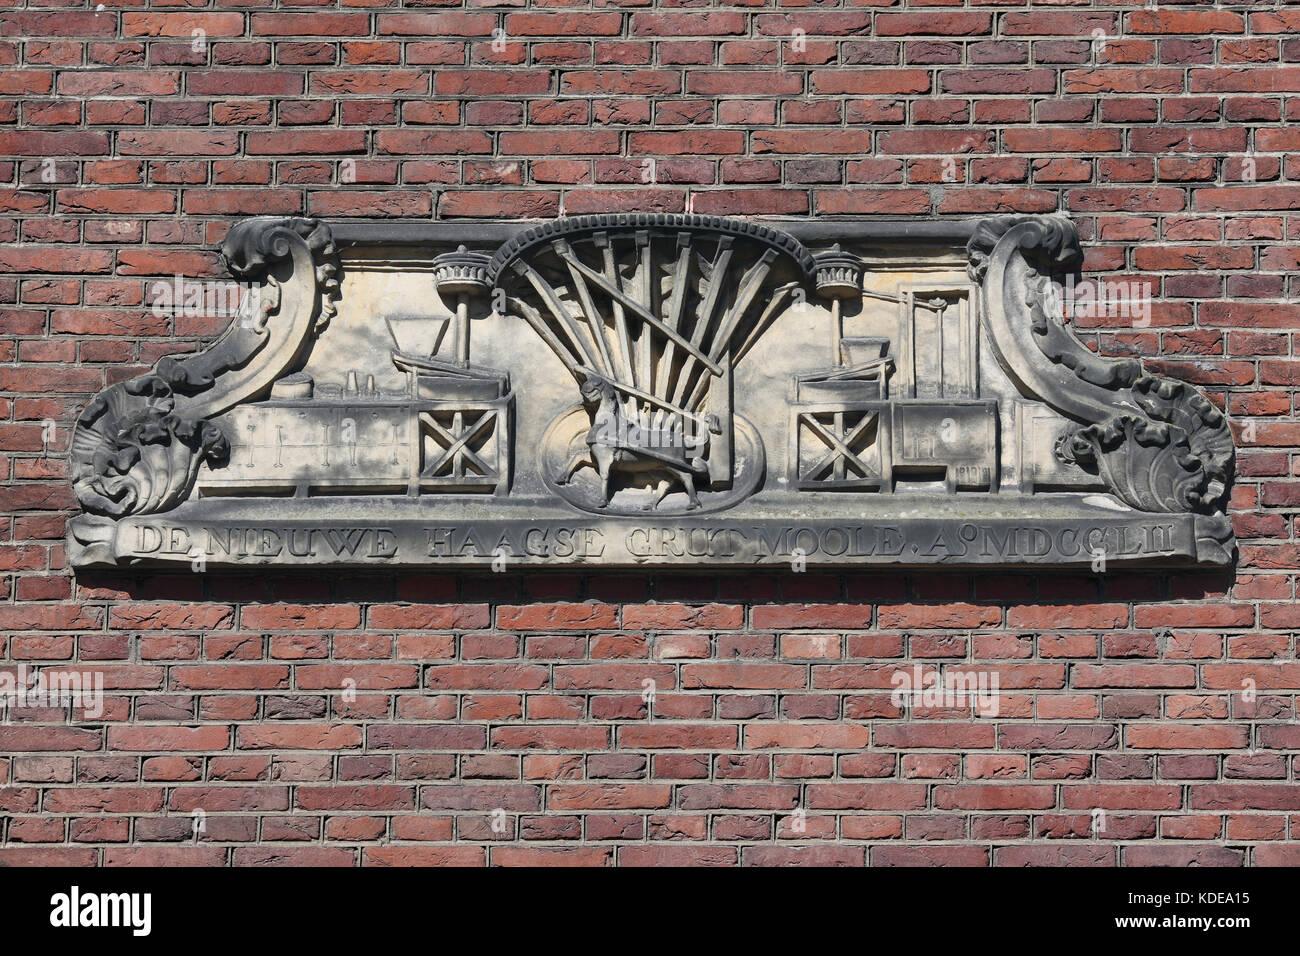 Relieve de piedra de molino tirado por caballos (como un caballo gin), en el lateral de un edificio en lange scheistraat, Imagen De Stock